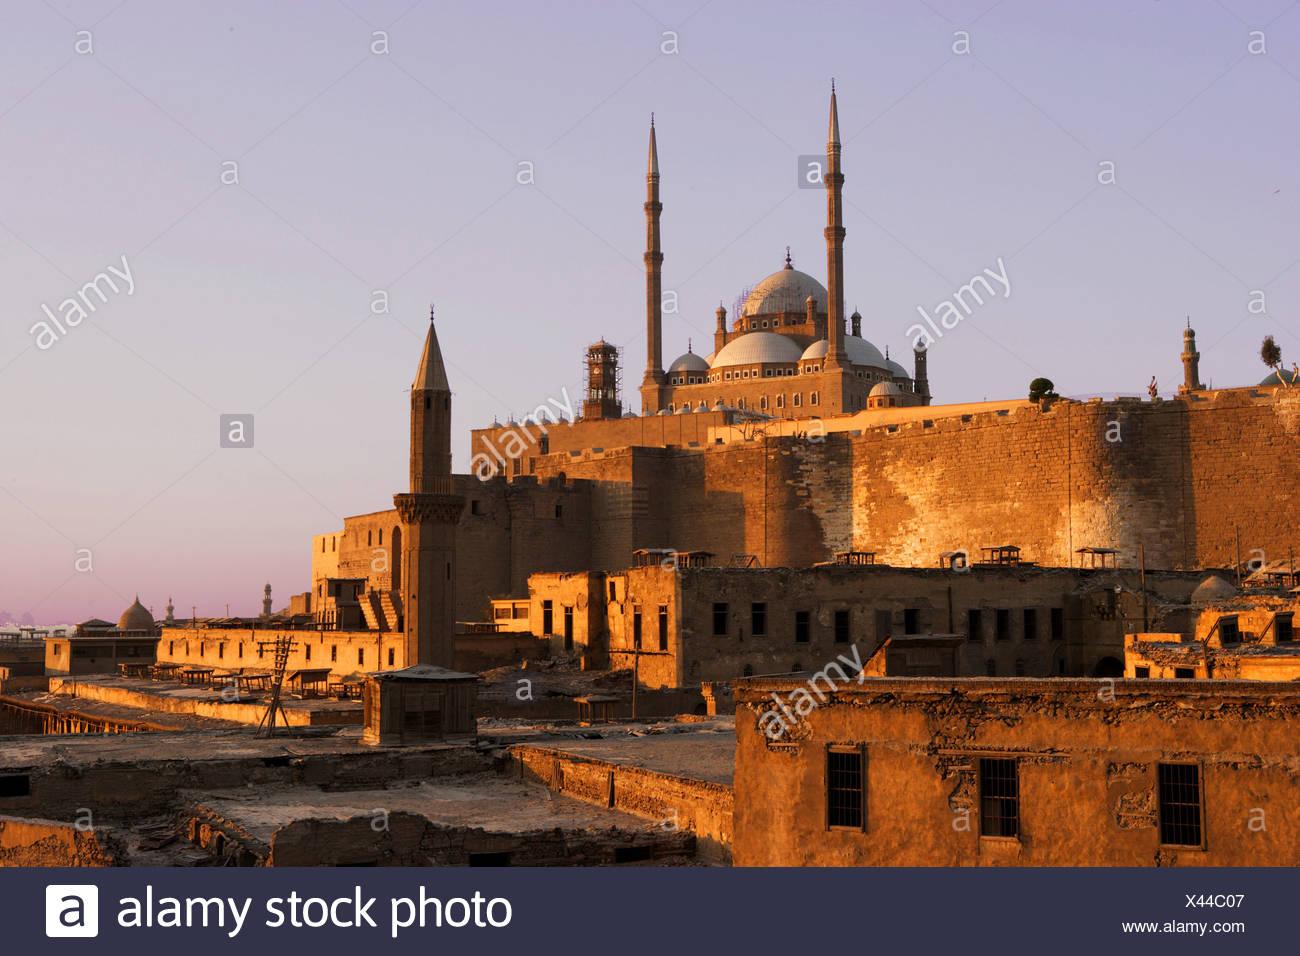 Egypt North Africa Cairo Muhammad Ali mosque alabaster mosque dusk twilight - Stock Image